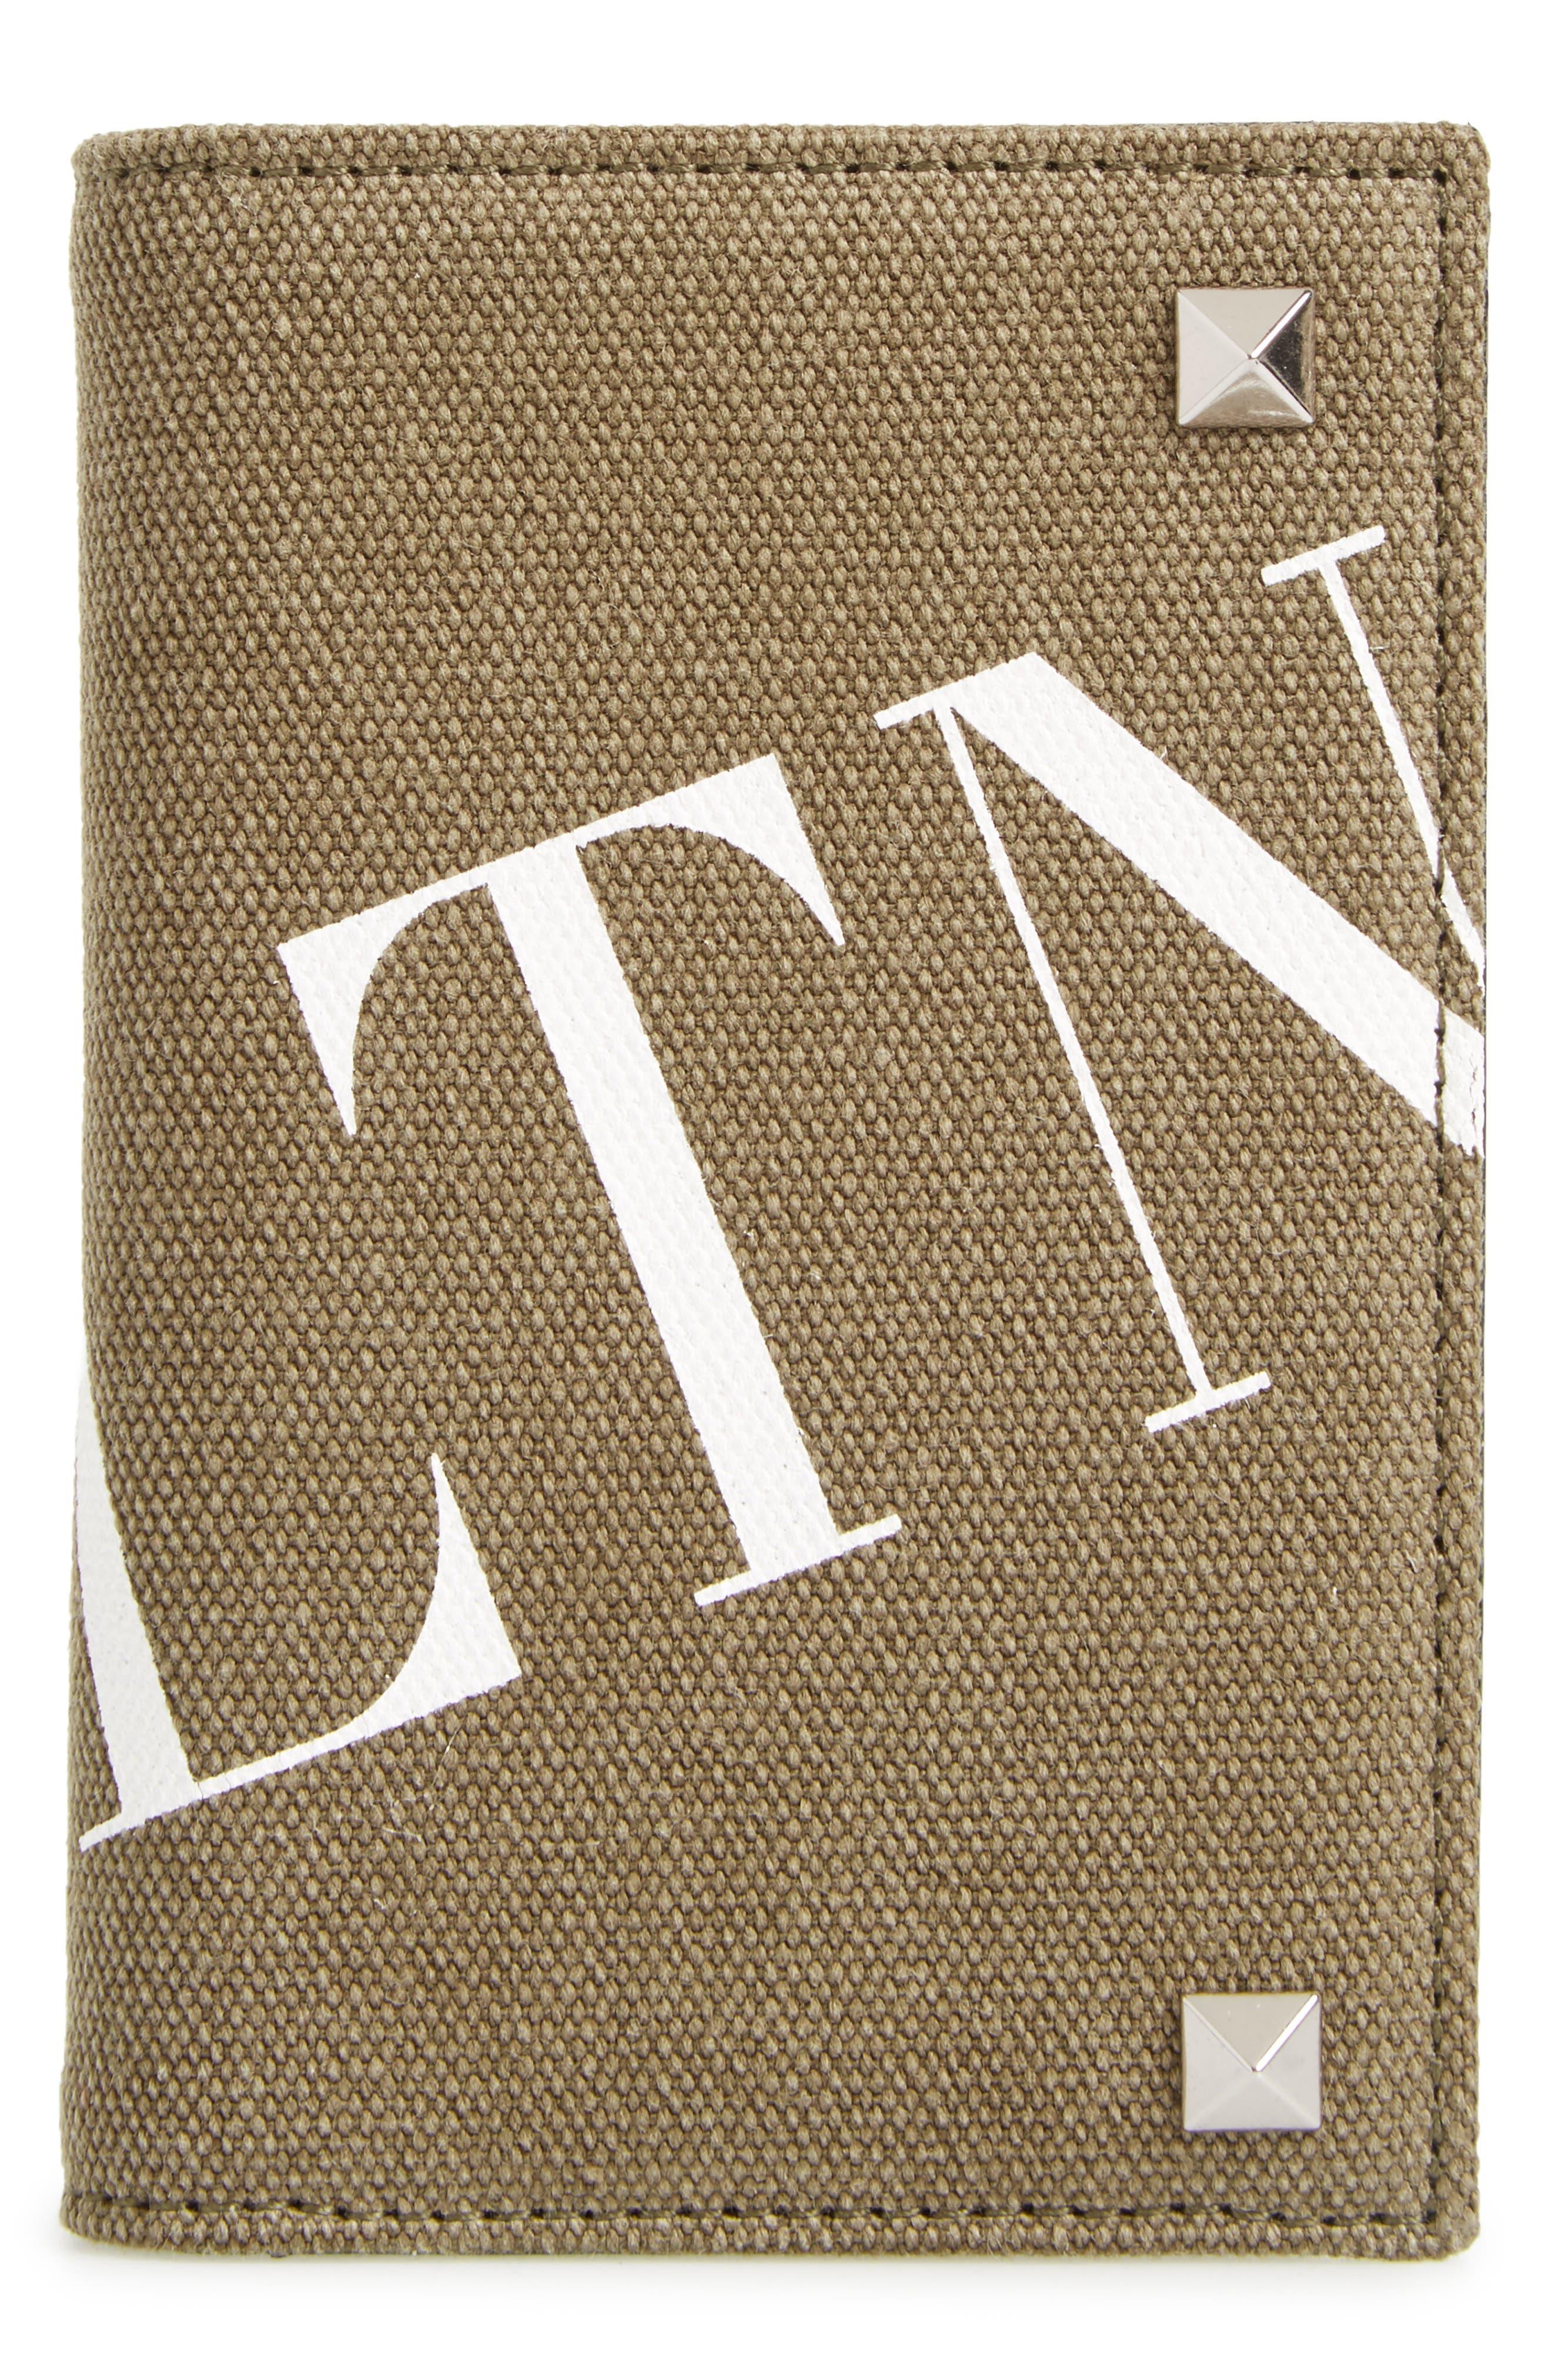 Main Image - VALENTINO GARAVANI Stud Canvas Wallet